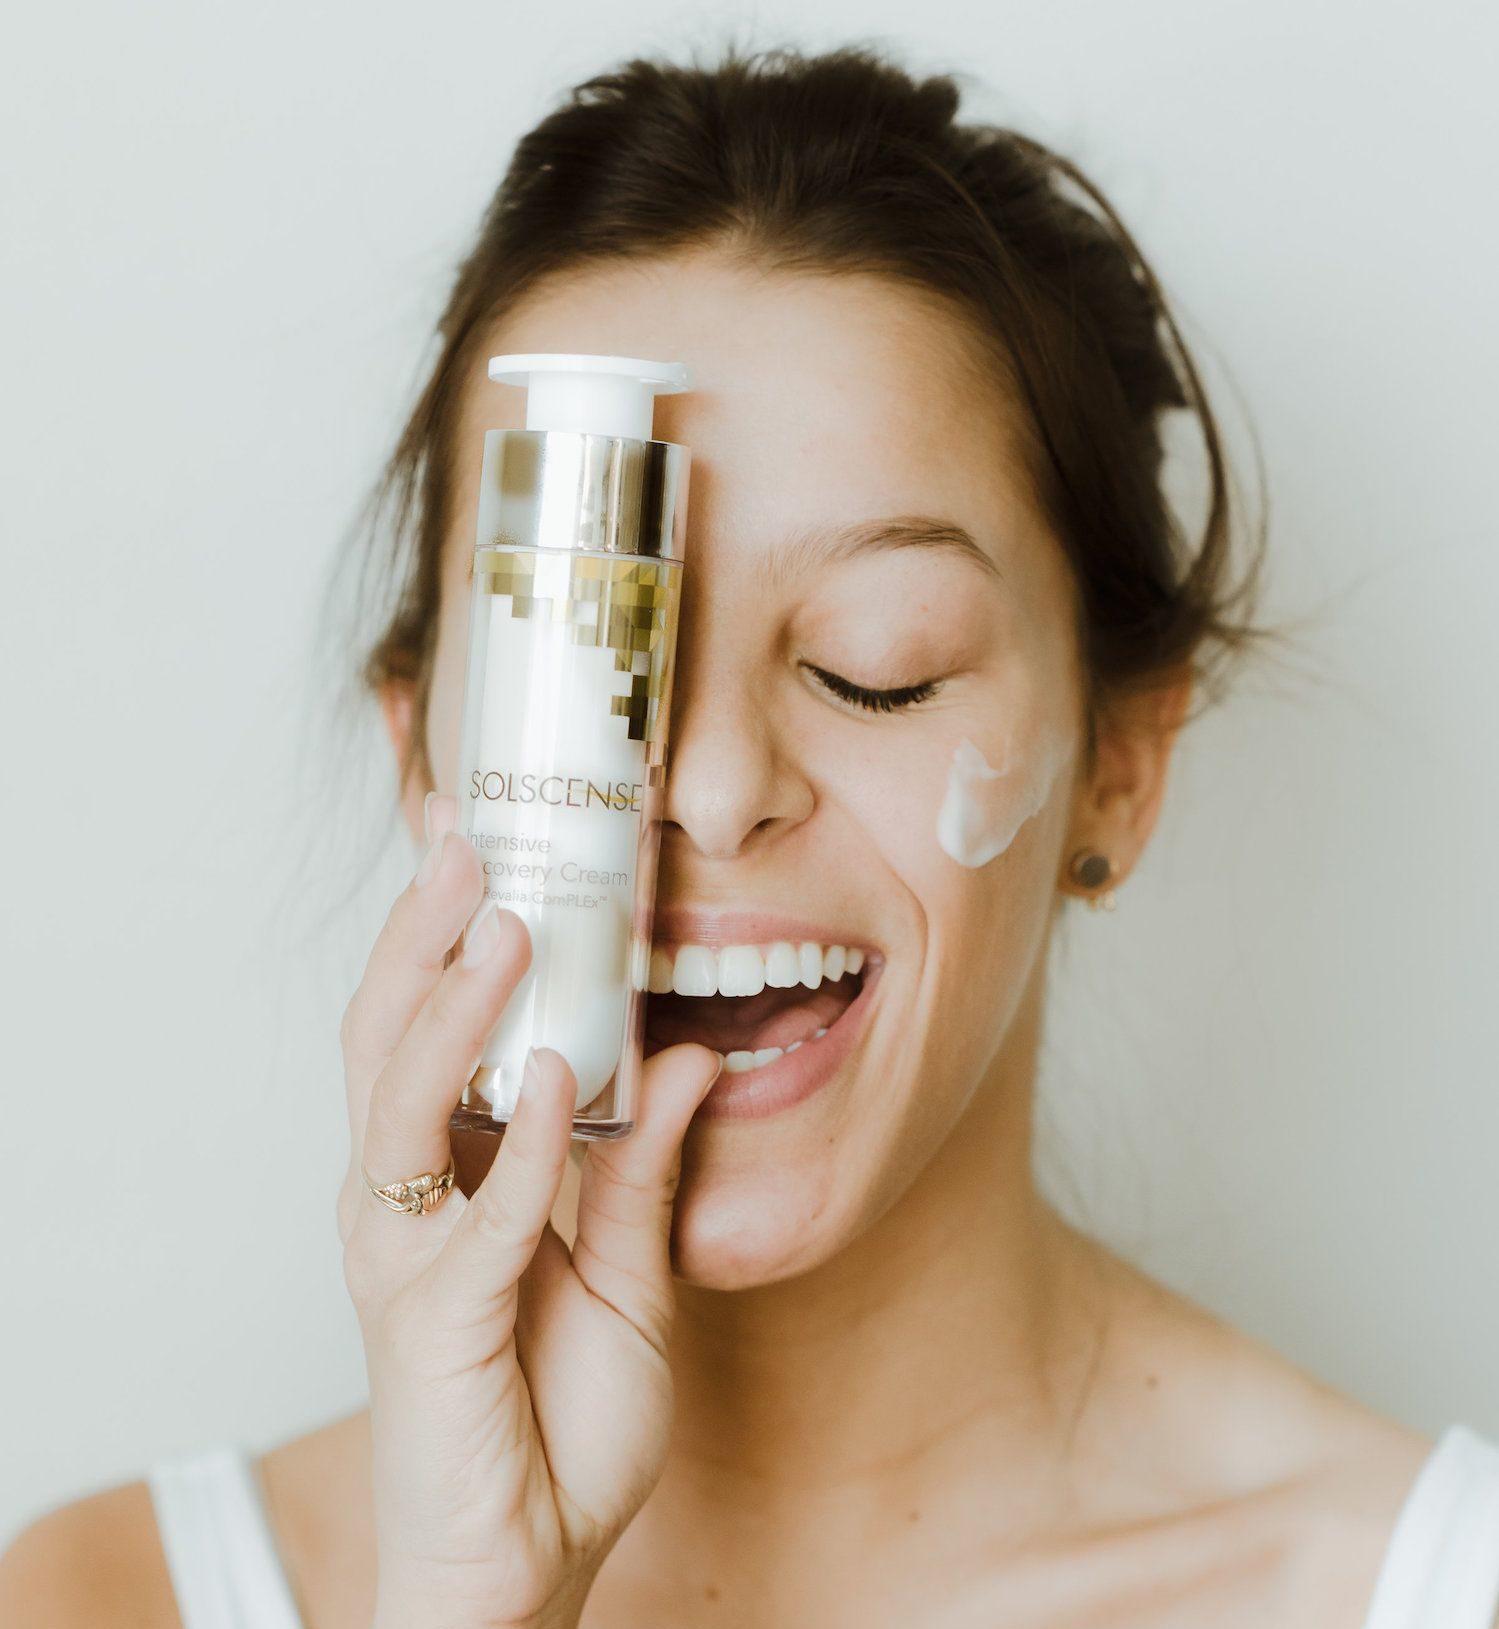 Solscense Natural Anti Aging Cream